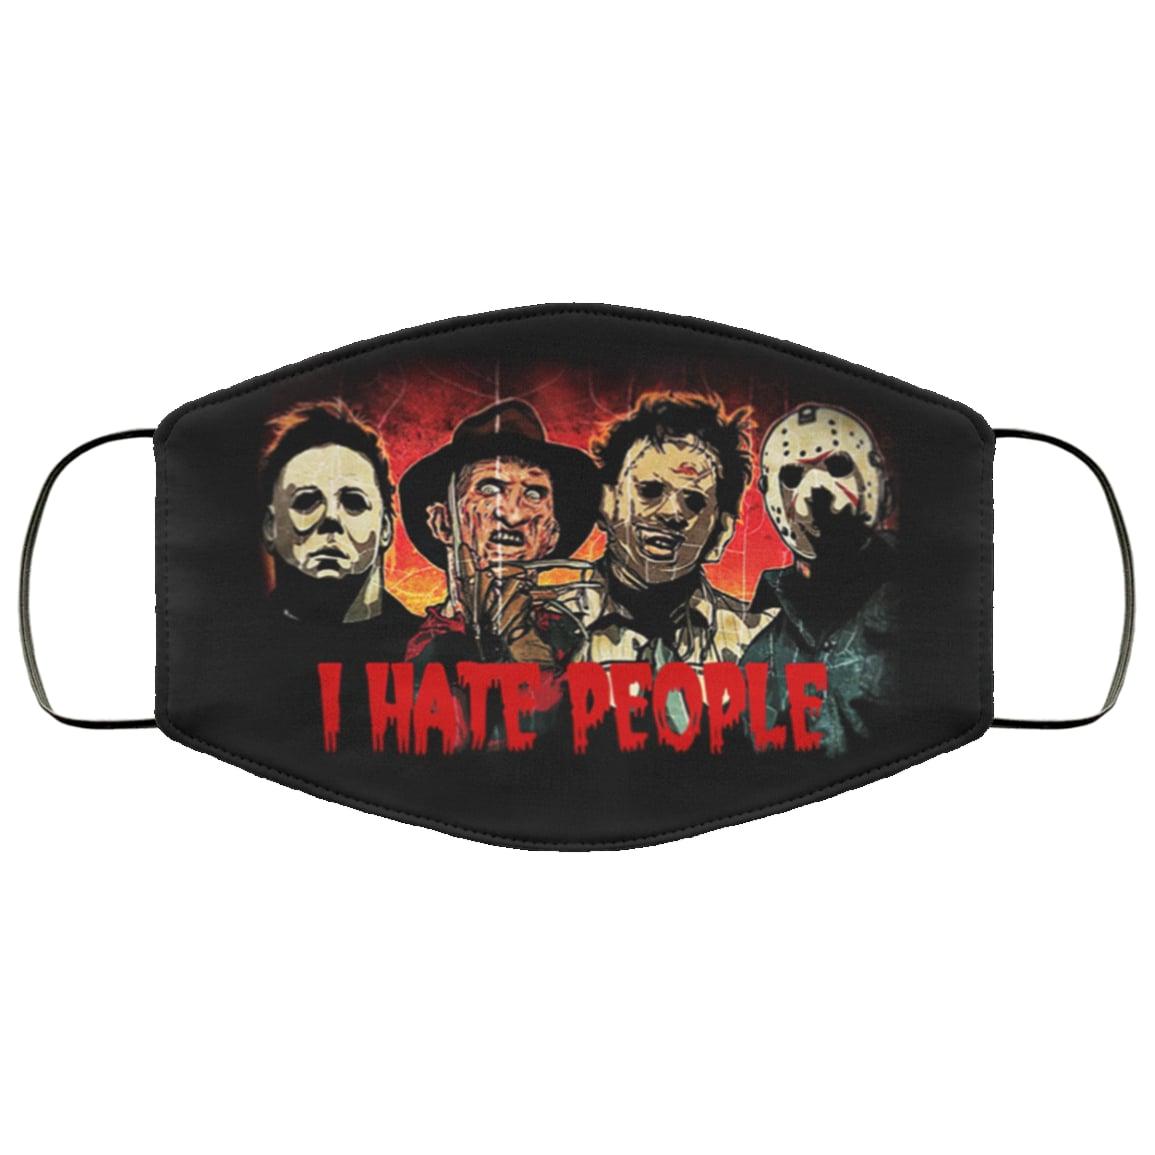 I hate people horror jason michael myers leatherfaces freddy face mask 4